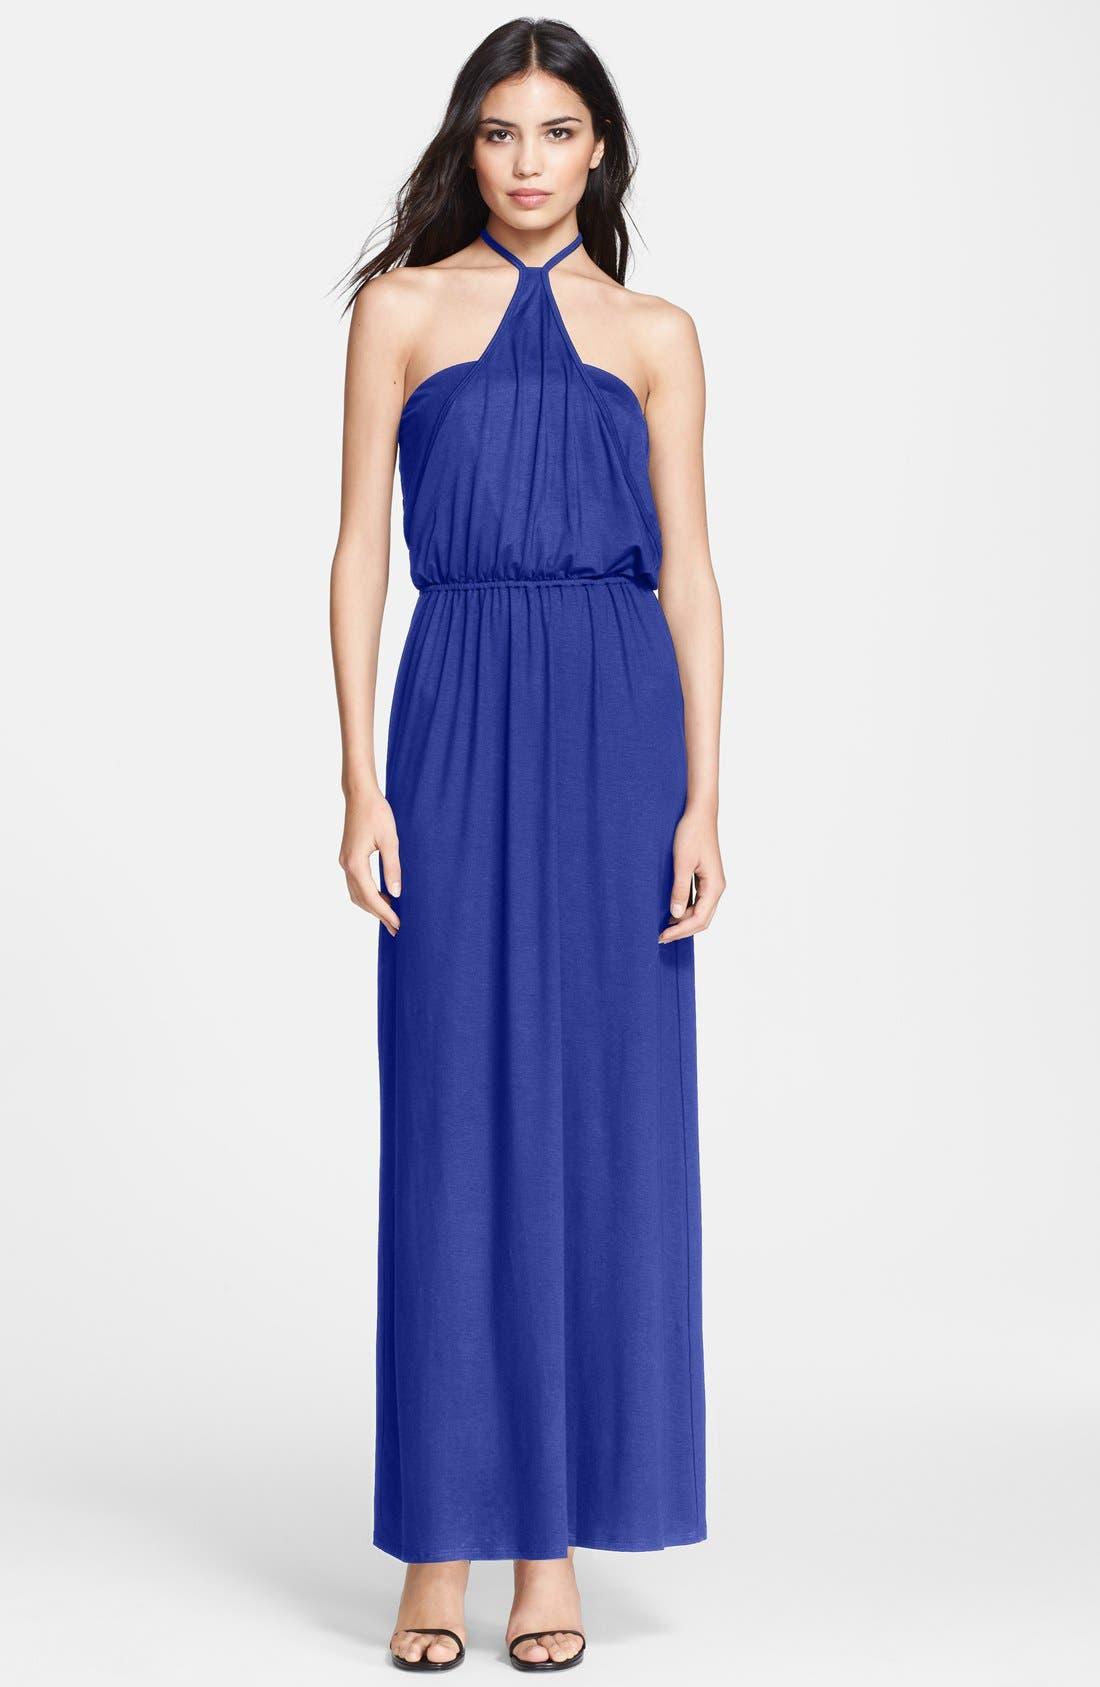 Alternate Image 1 Selected - Trina Turk 'Goldie' Jersey Maxi Dress